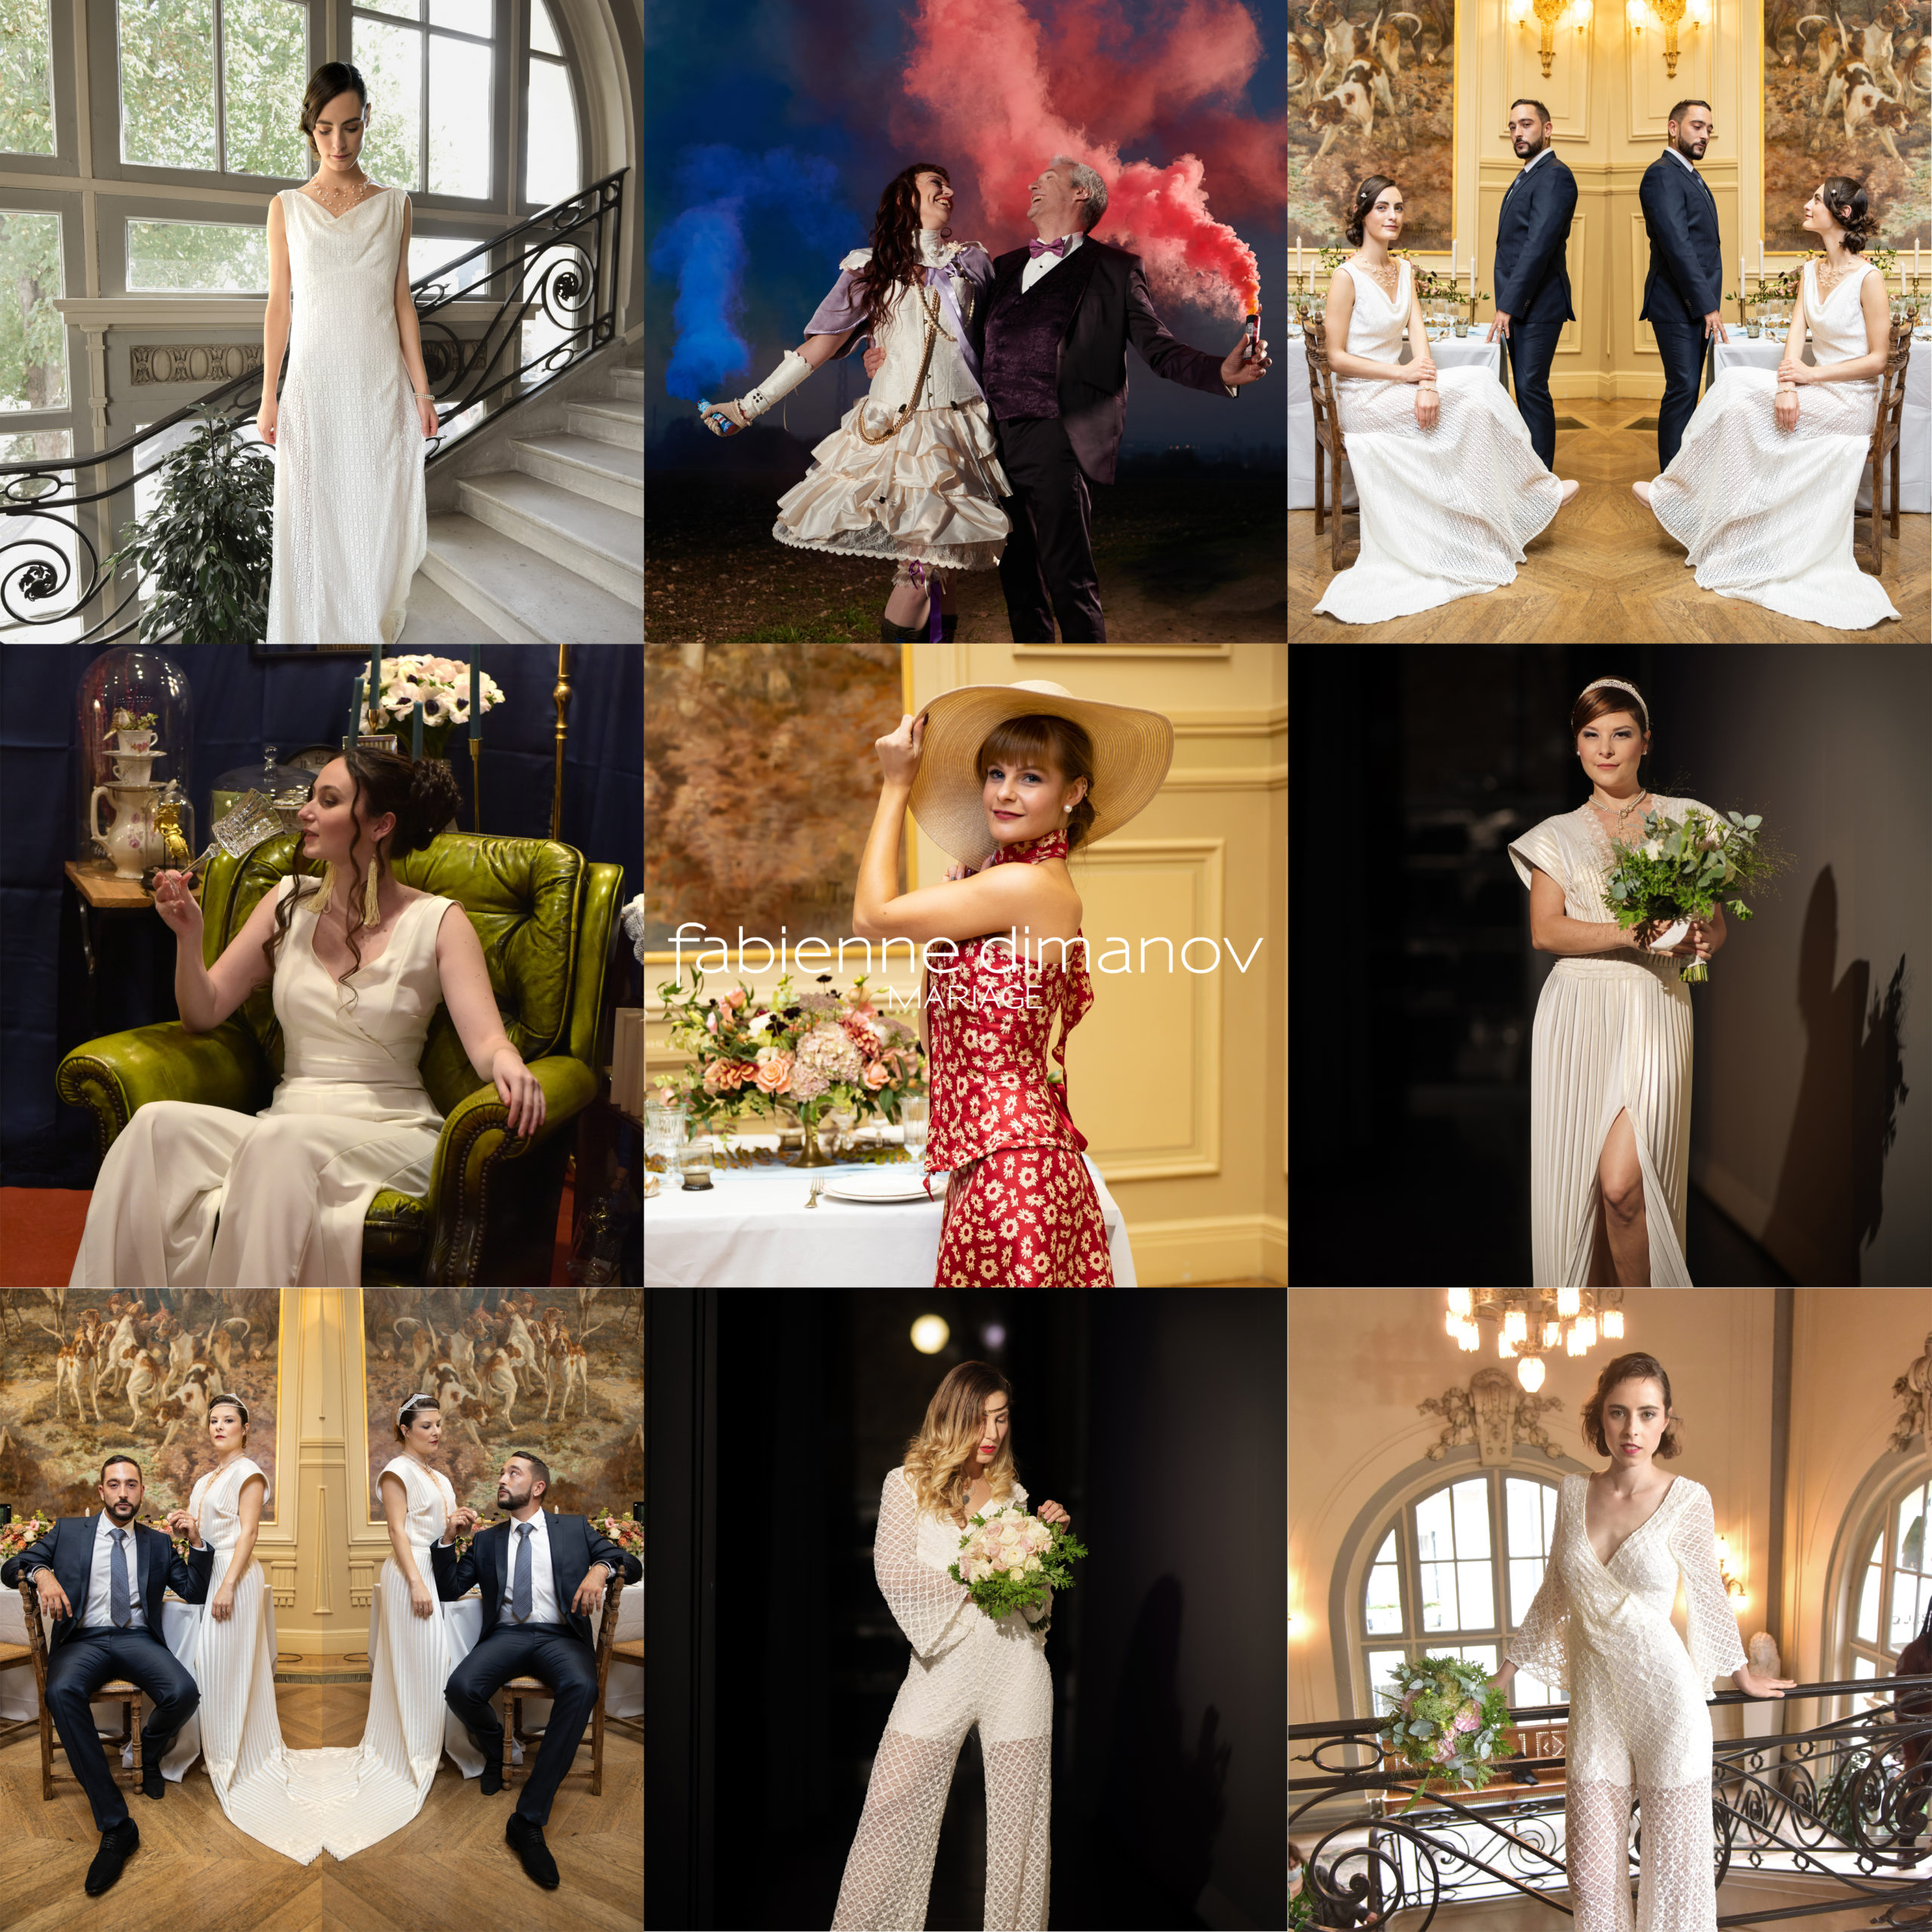 Rétrospective 2020 – Fabienne Dimanov Mariage